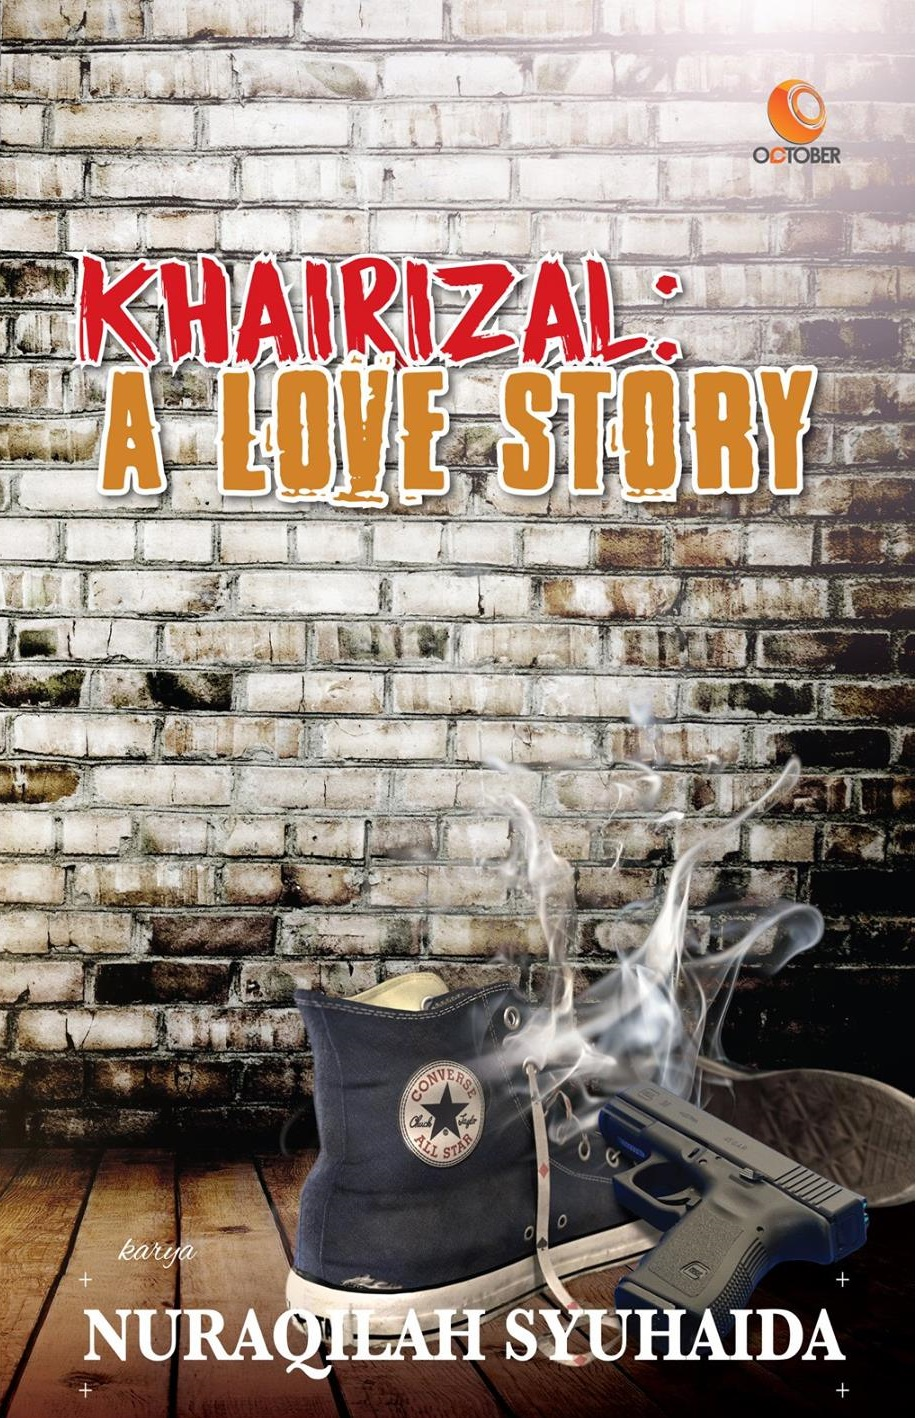 KhaiRizal : A Love Story (2015)